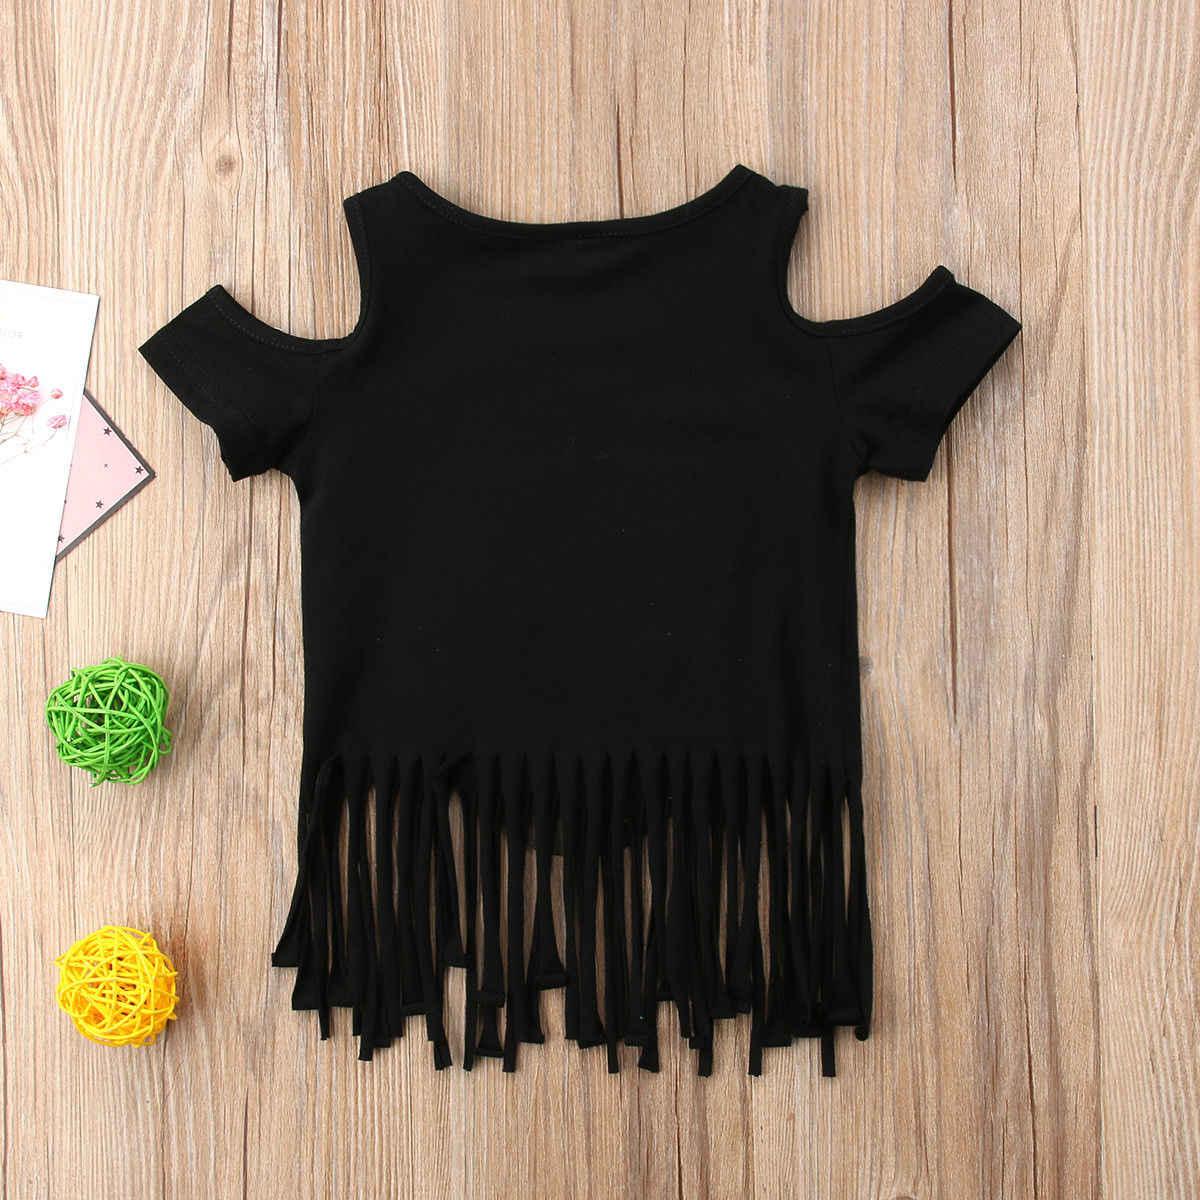 bdc8496b3fec2 ... 2018 Sequins Owl Printed Tops Toddler Kids Baby Girl Tassel T-shirt  Cotton Summer Cute ...